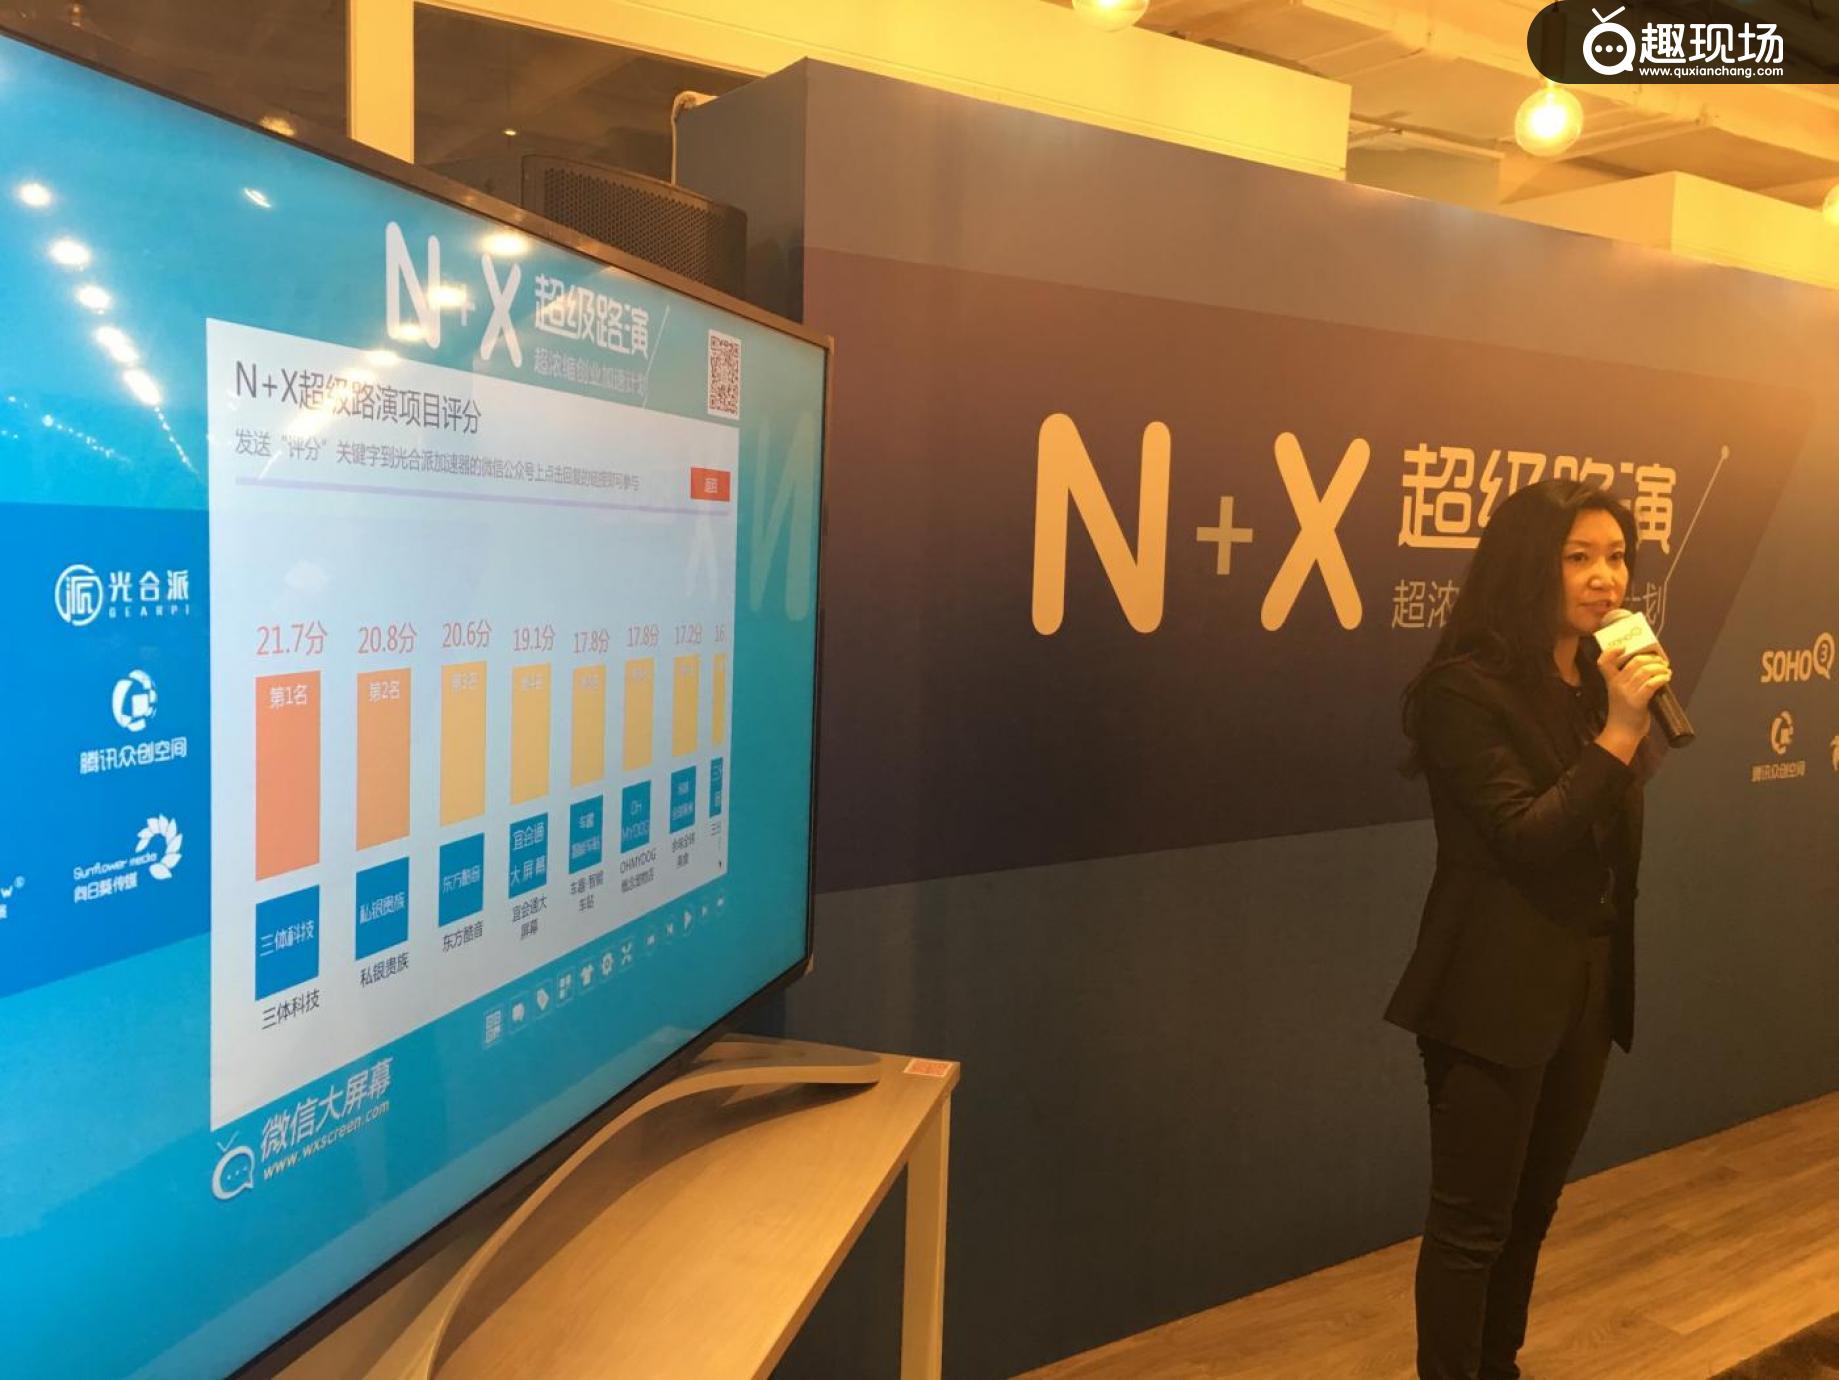 《N+X超级路演》第二期 趣现场-微信大屏幕创始人首亮相